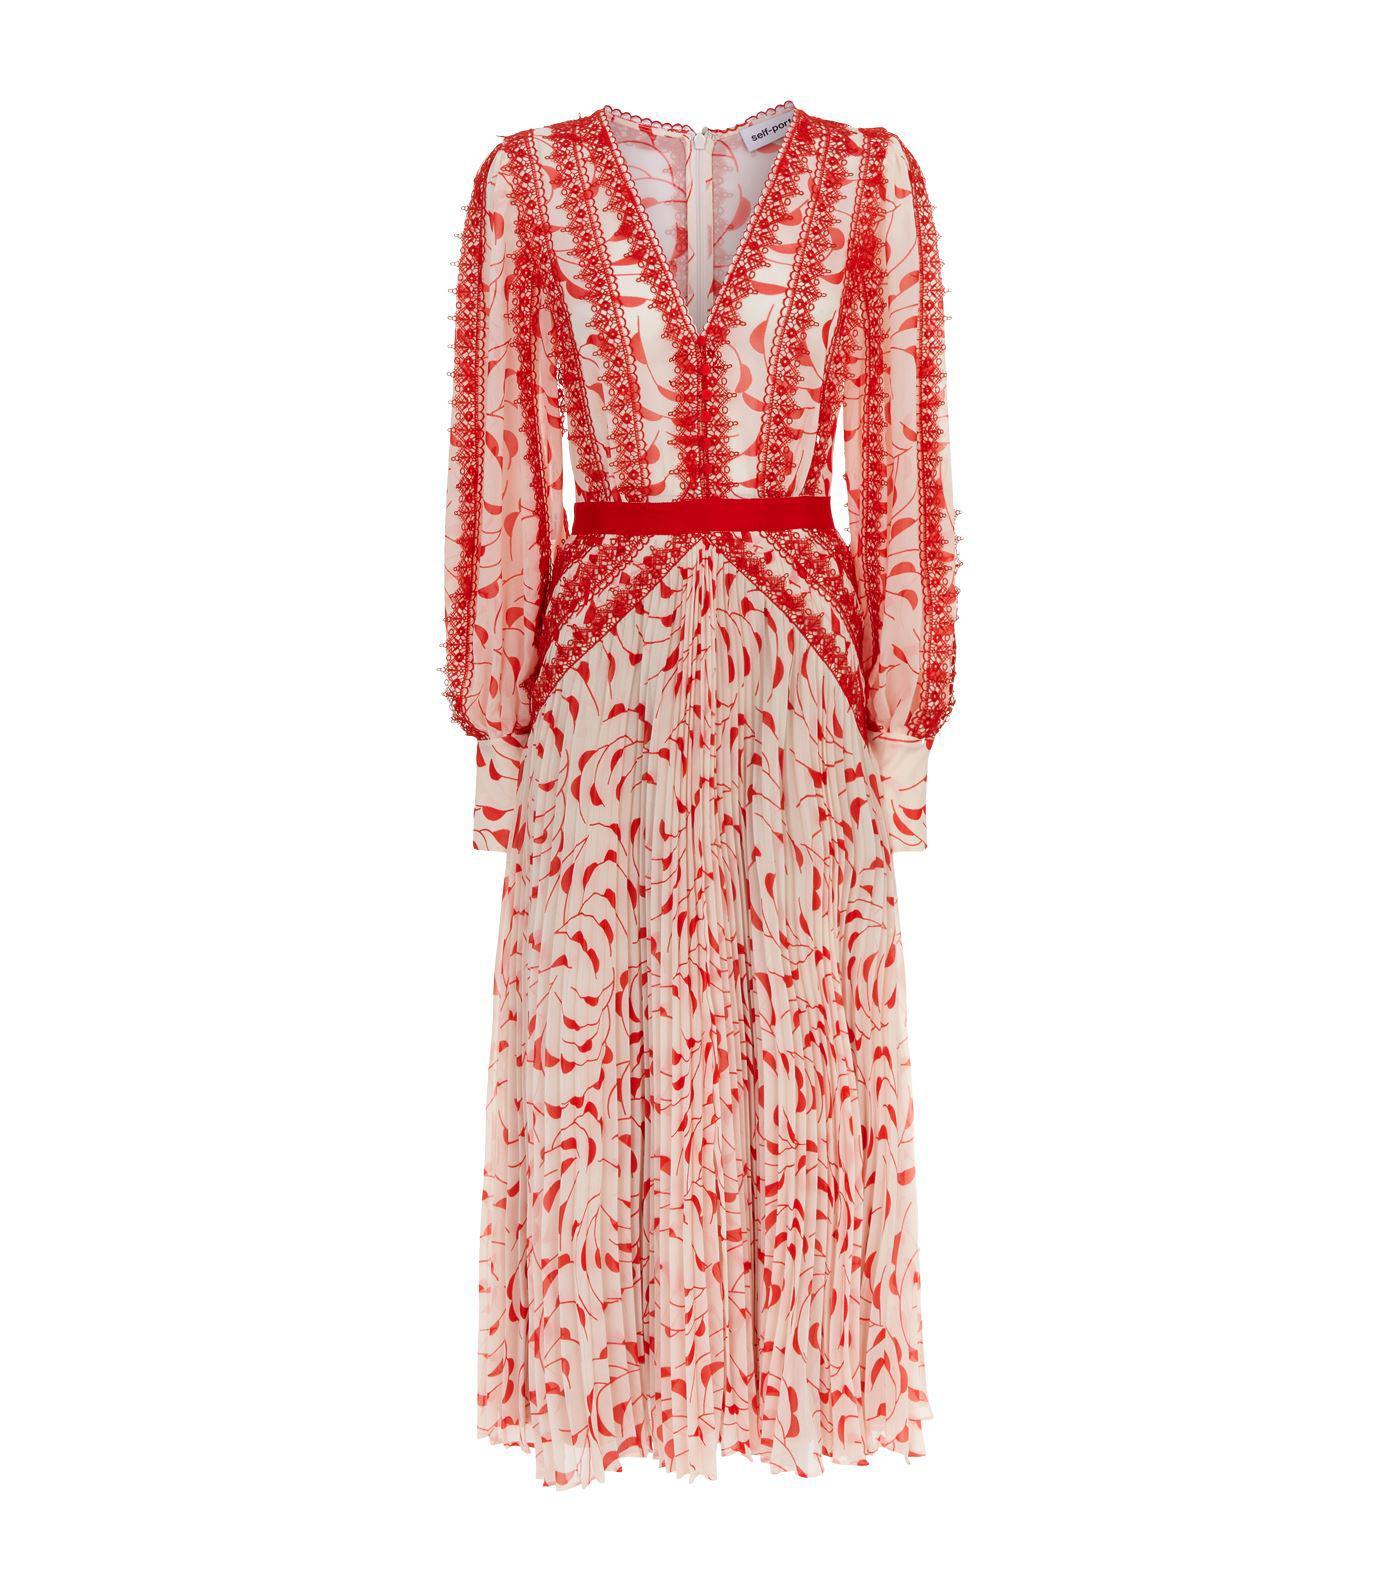 9b93d3805a105 Self-Portrait Printed Chiffon Lace Pleated Long-sleeve Midi Dress ...